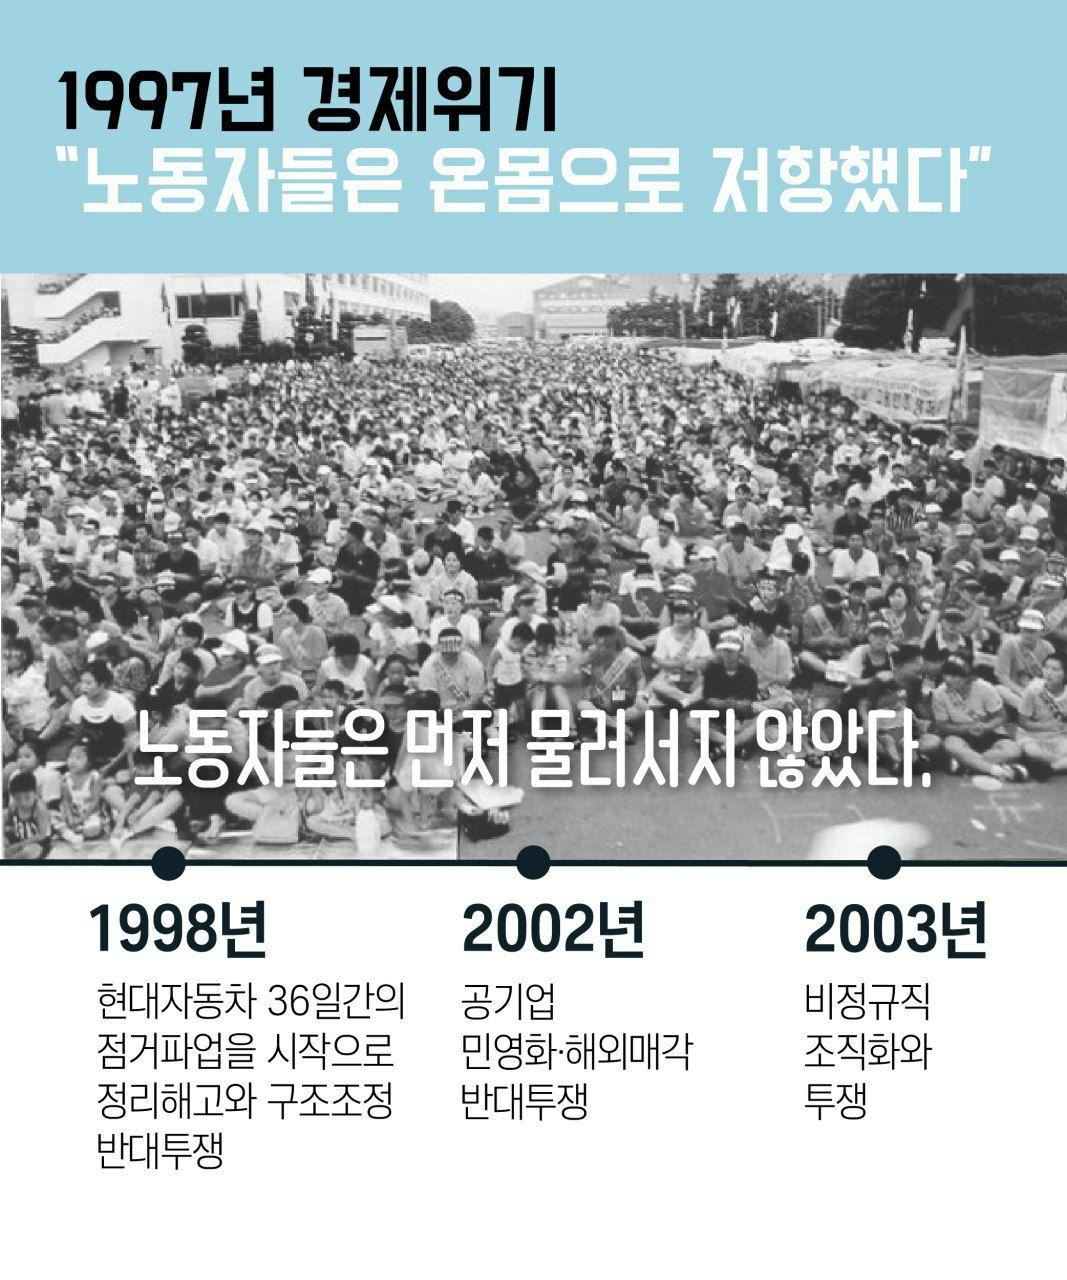 photo_2020-06-03_19-57-24.jpg